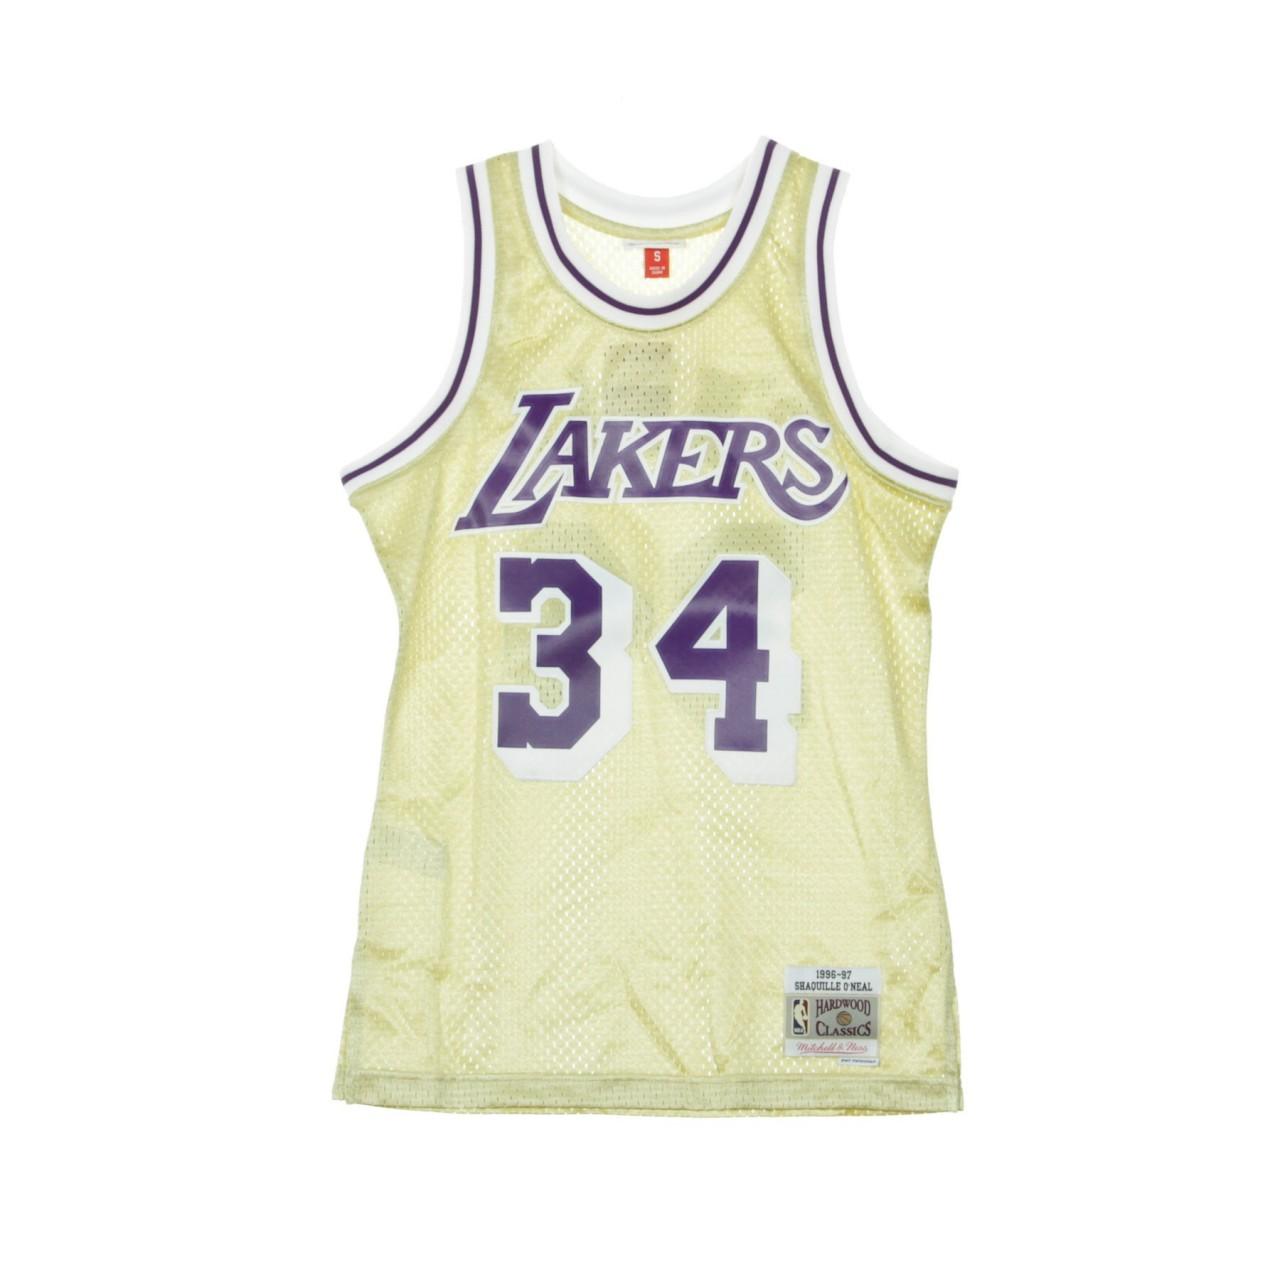 MITCHELL & NESS NBA SWIMGMAN JERSEY SHAQUILLE O'NEAL NO.34 1996-97 LOSLAK GOLD BA897L-LAL-D-L6G